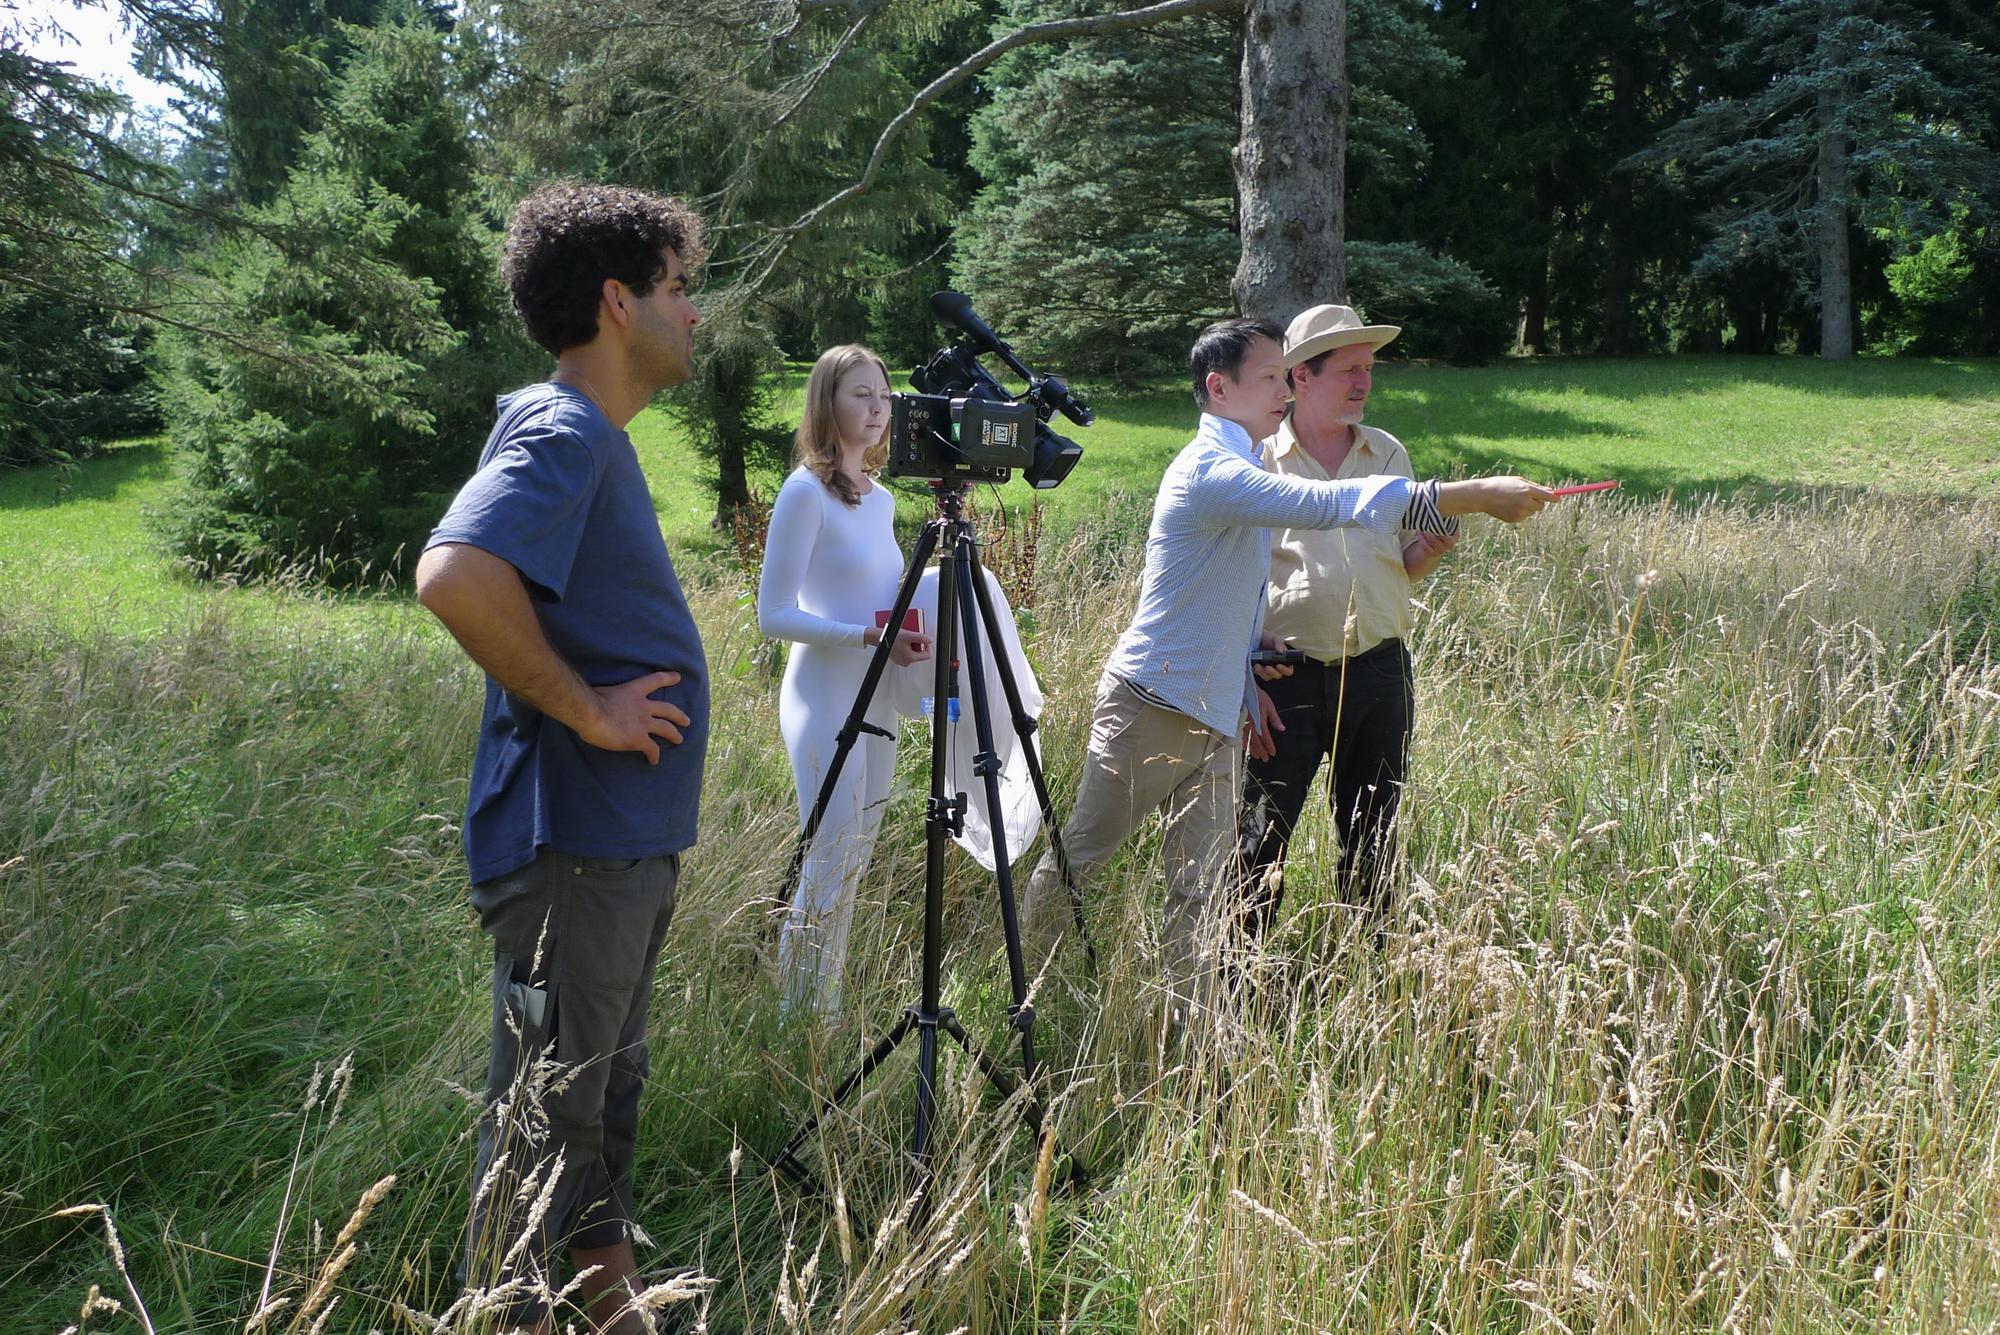 Shen Wei directing at the Arnold Arboretum of Harvard University